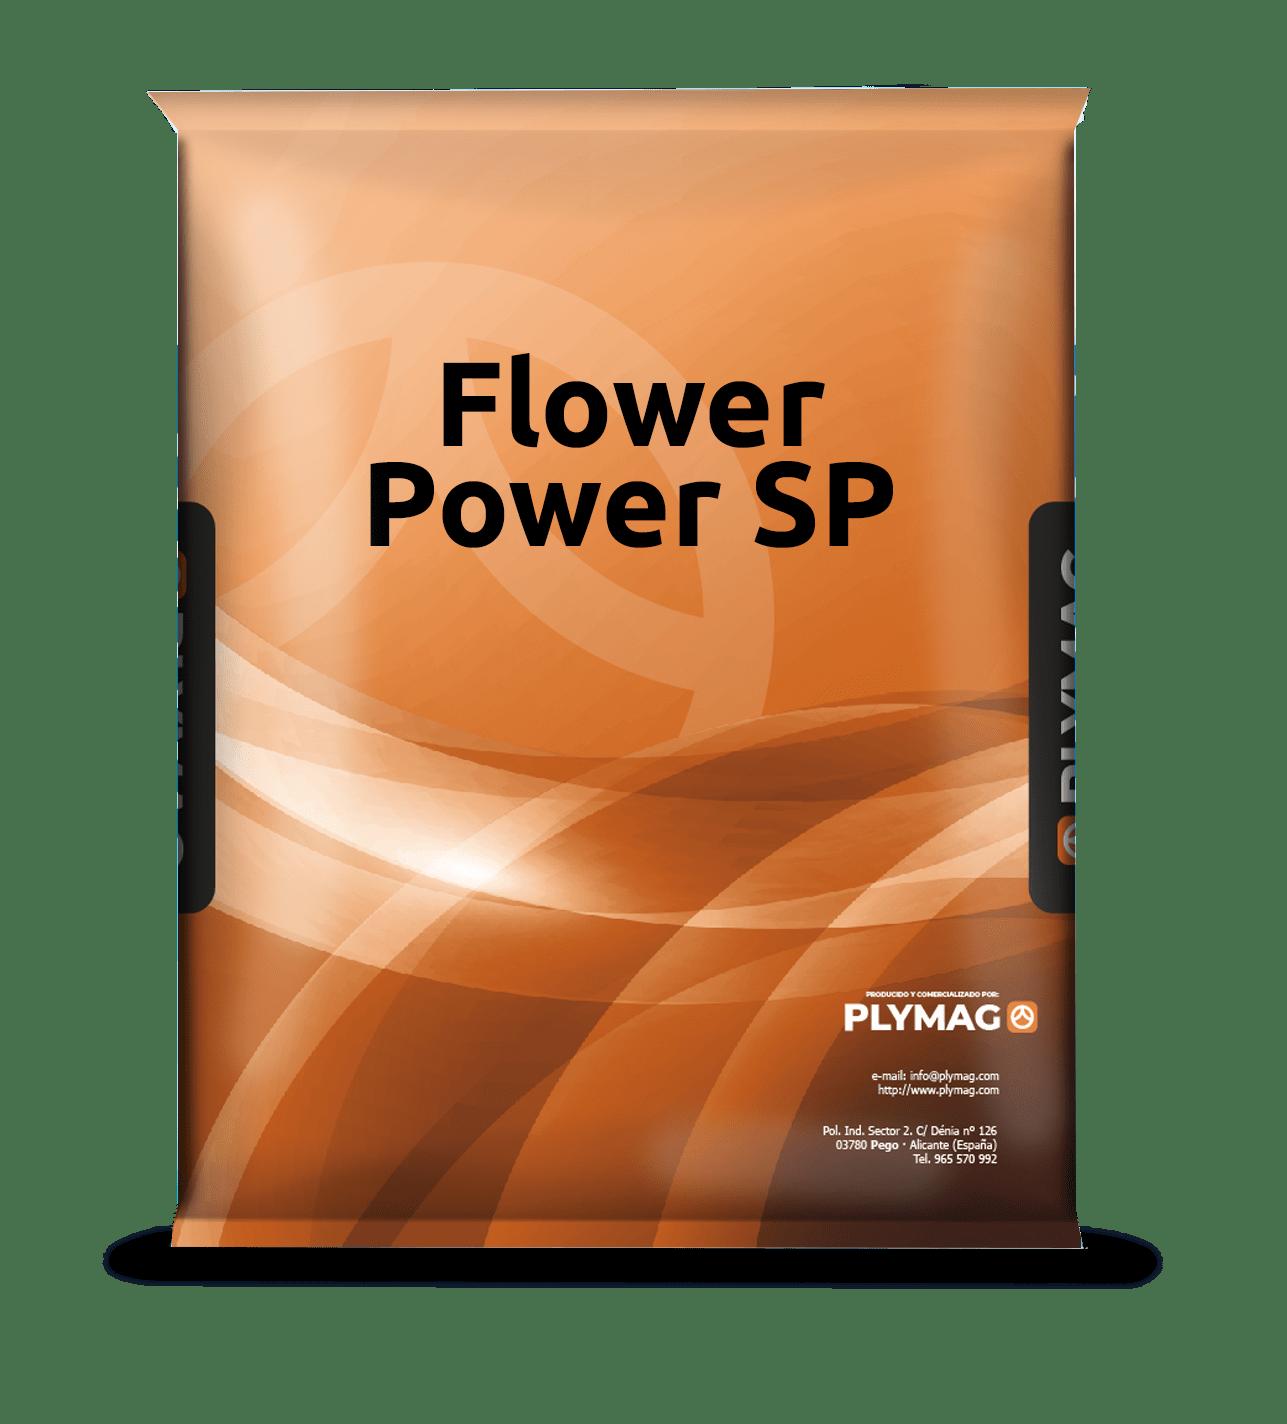 Flower Power SP